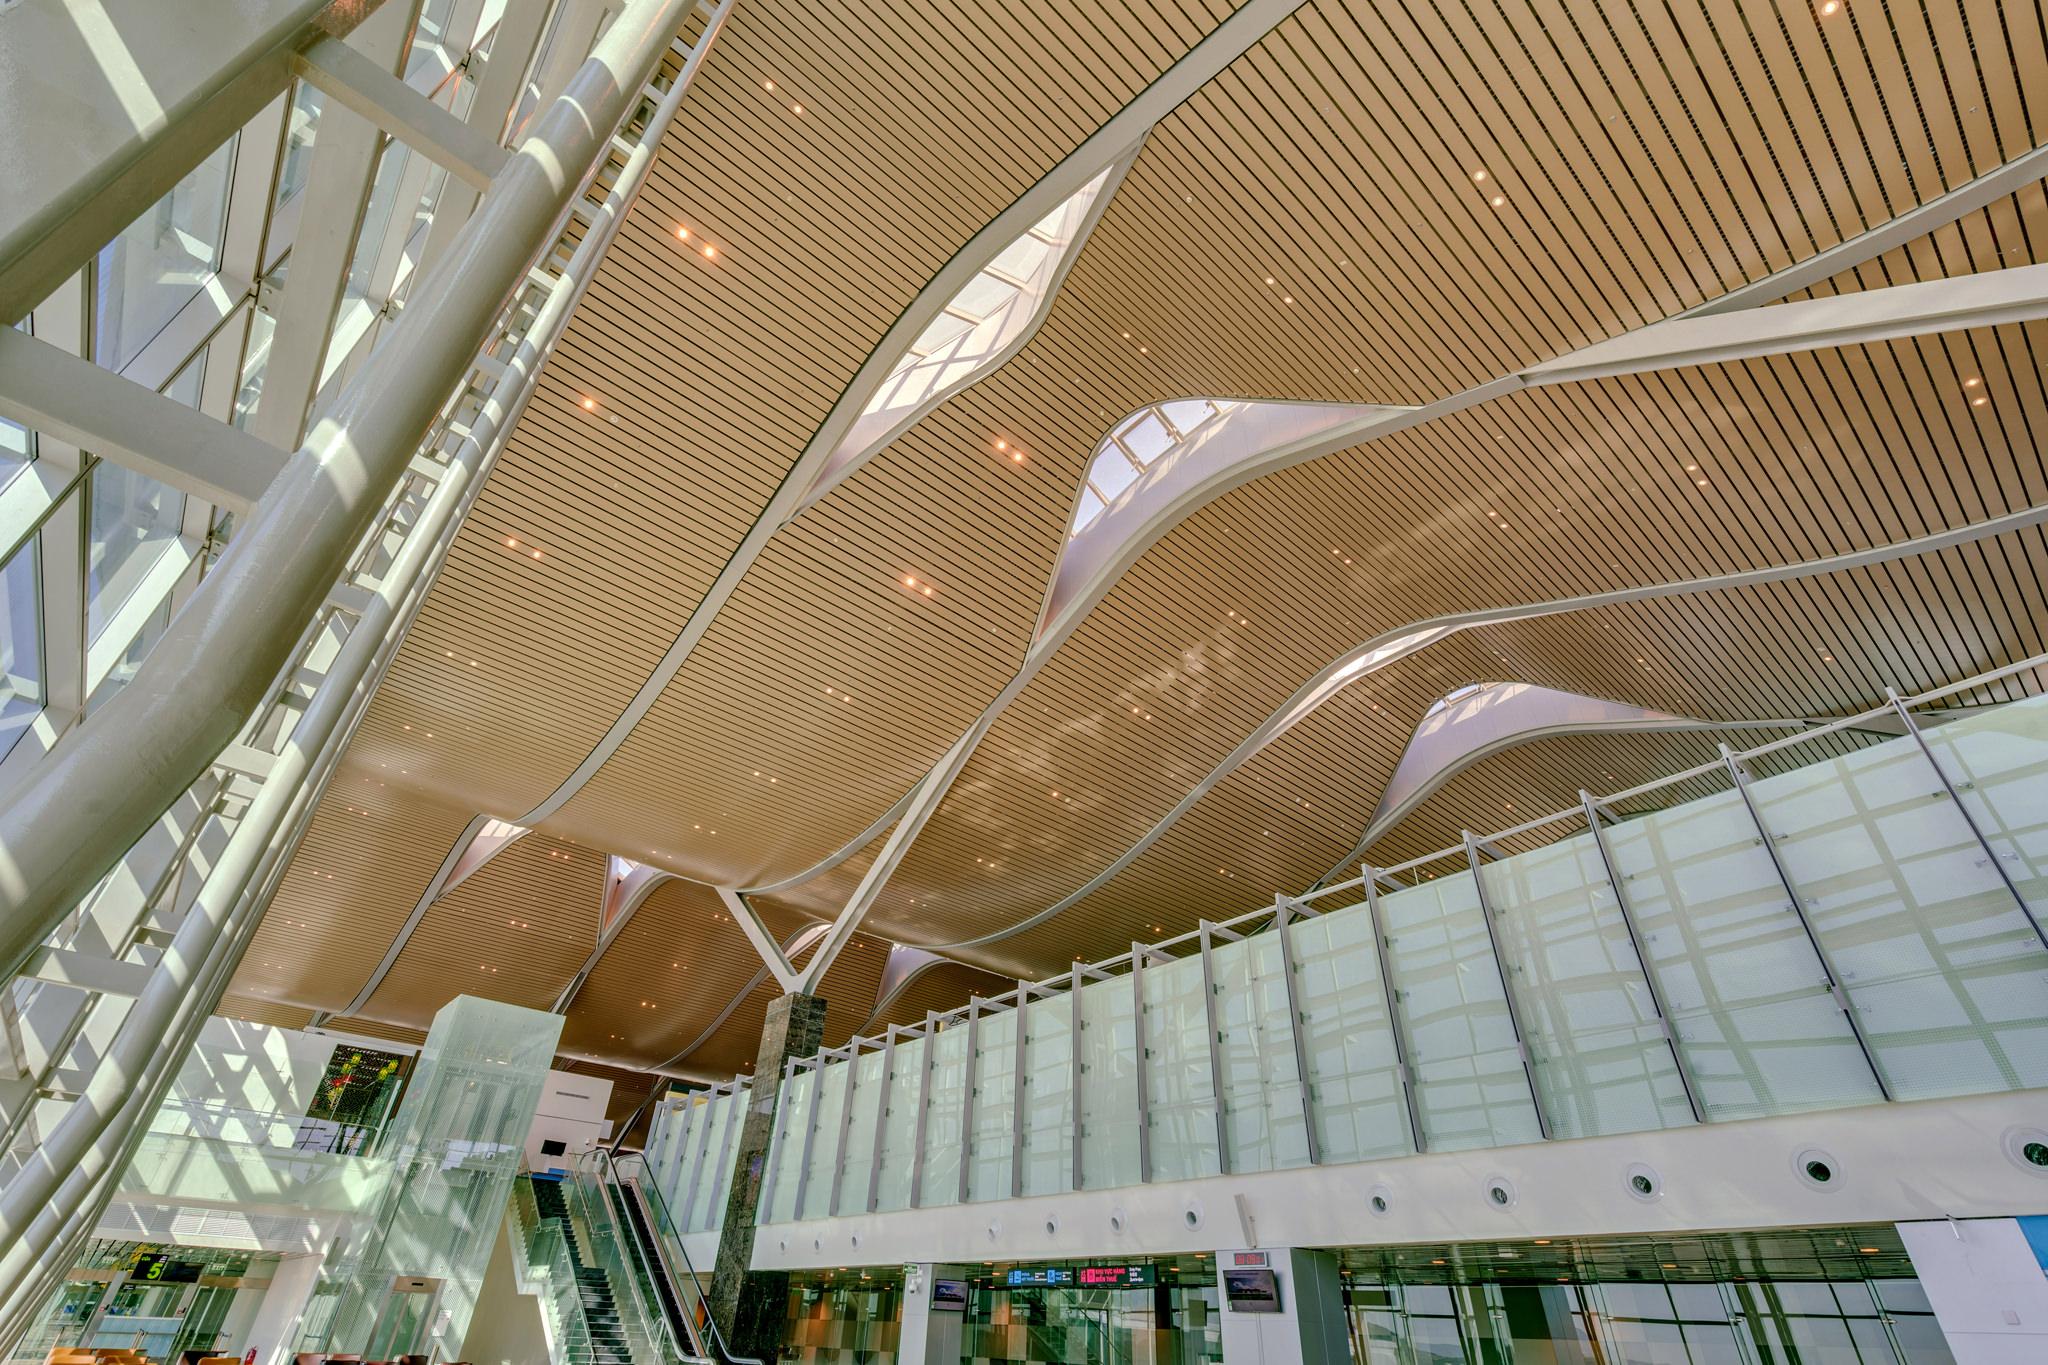 20180626 - Cam Ranh Airport - Architecture - 0204.jpg